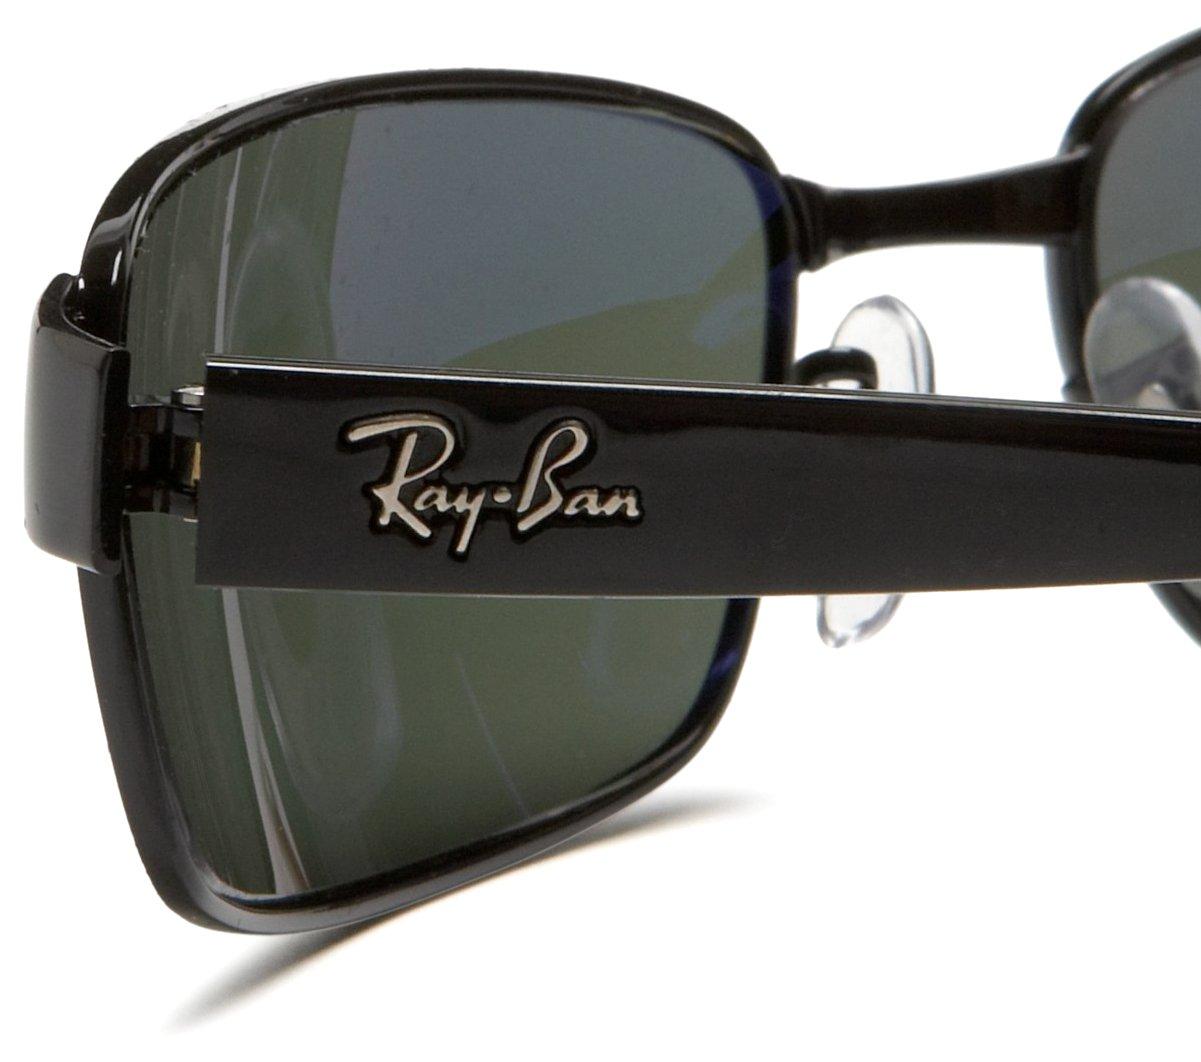 Ray-Ban RB3364 Rectangular Metal Sunglasses, Black/Polarized Green, 62 mm by Ray-Ban (Image #4)